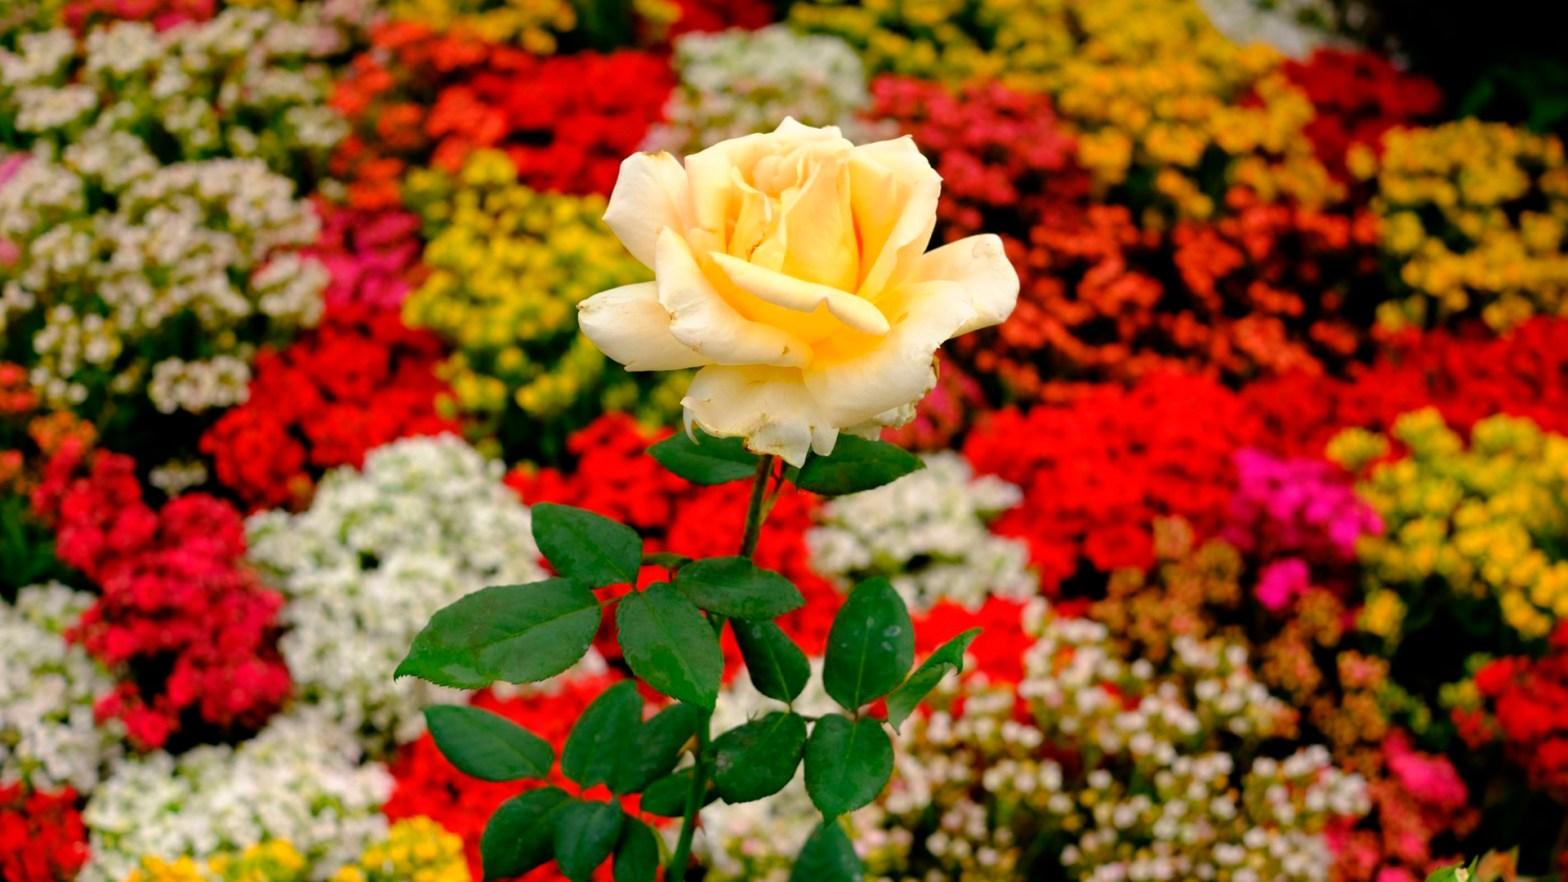 imagen de una rosa color naranja frente a un cargamento de flores